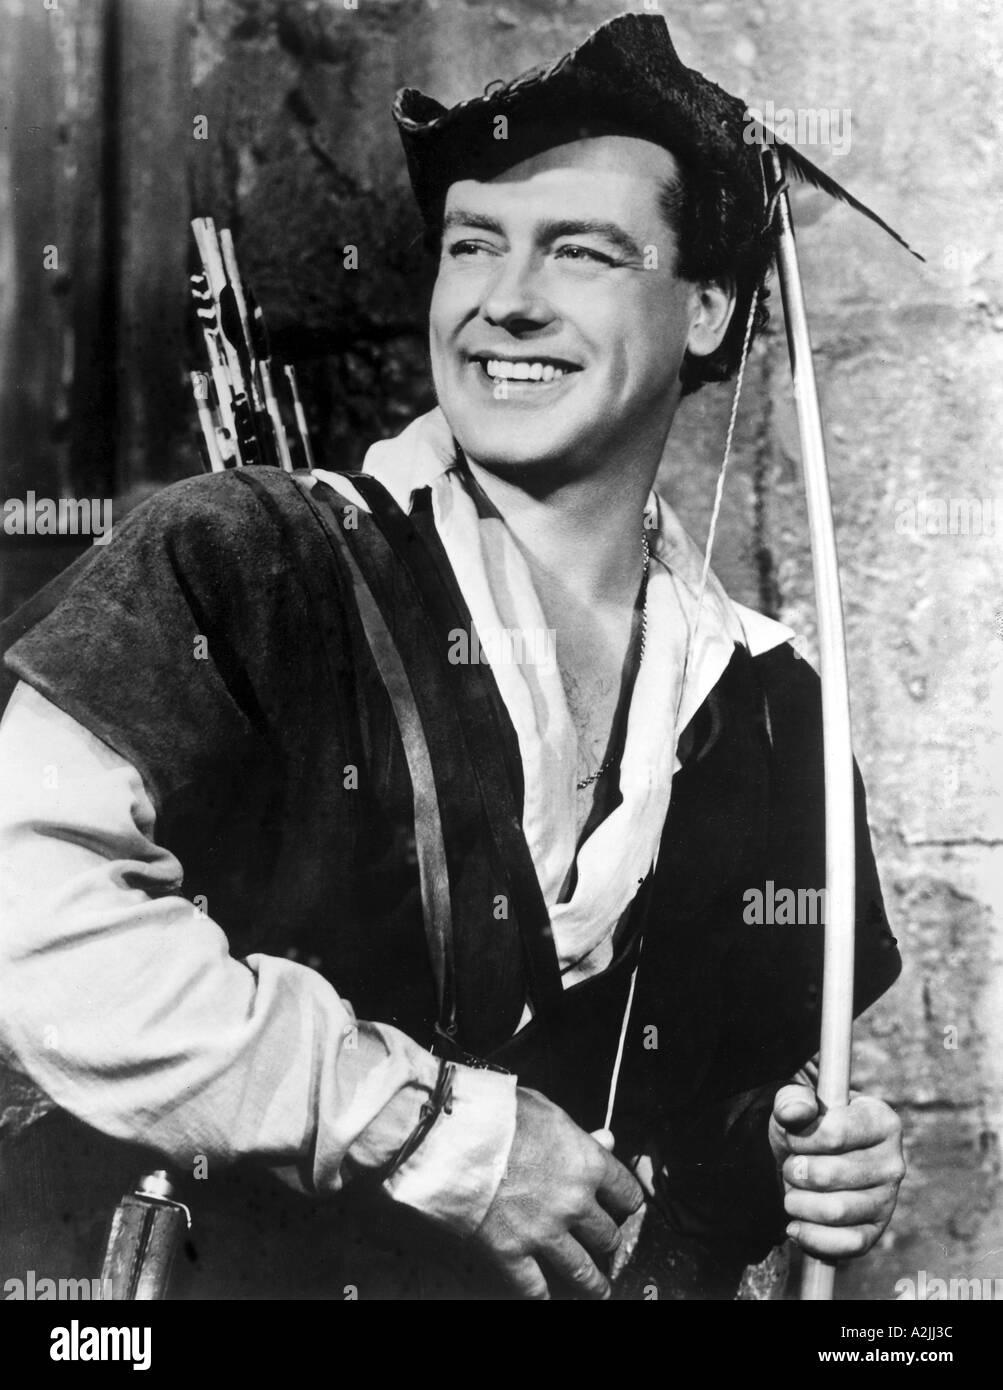 ADVENTURES OF ROBIN HOOD UK TV series from 1955 1960 with Richard Greene as Robin Hood - Stock Image